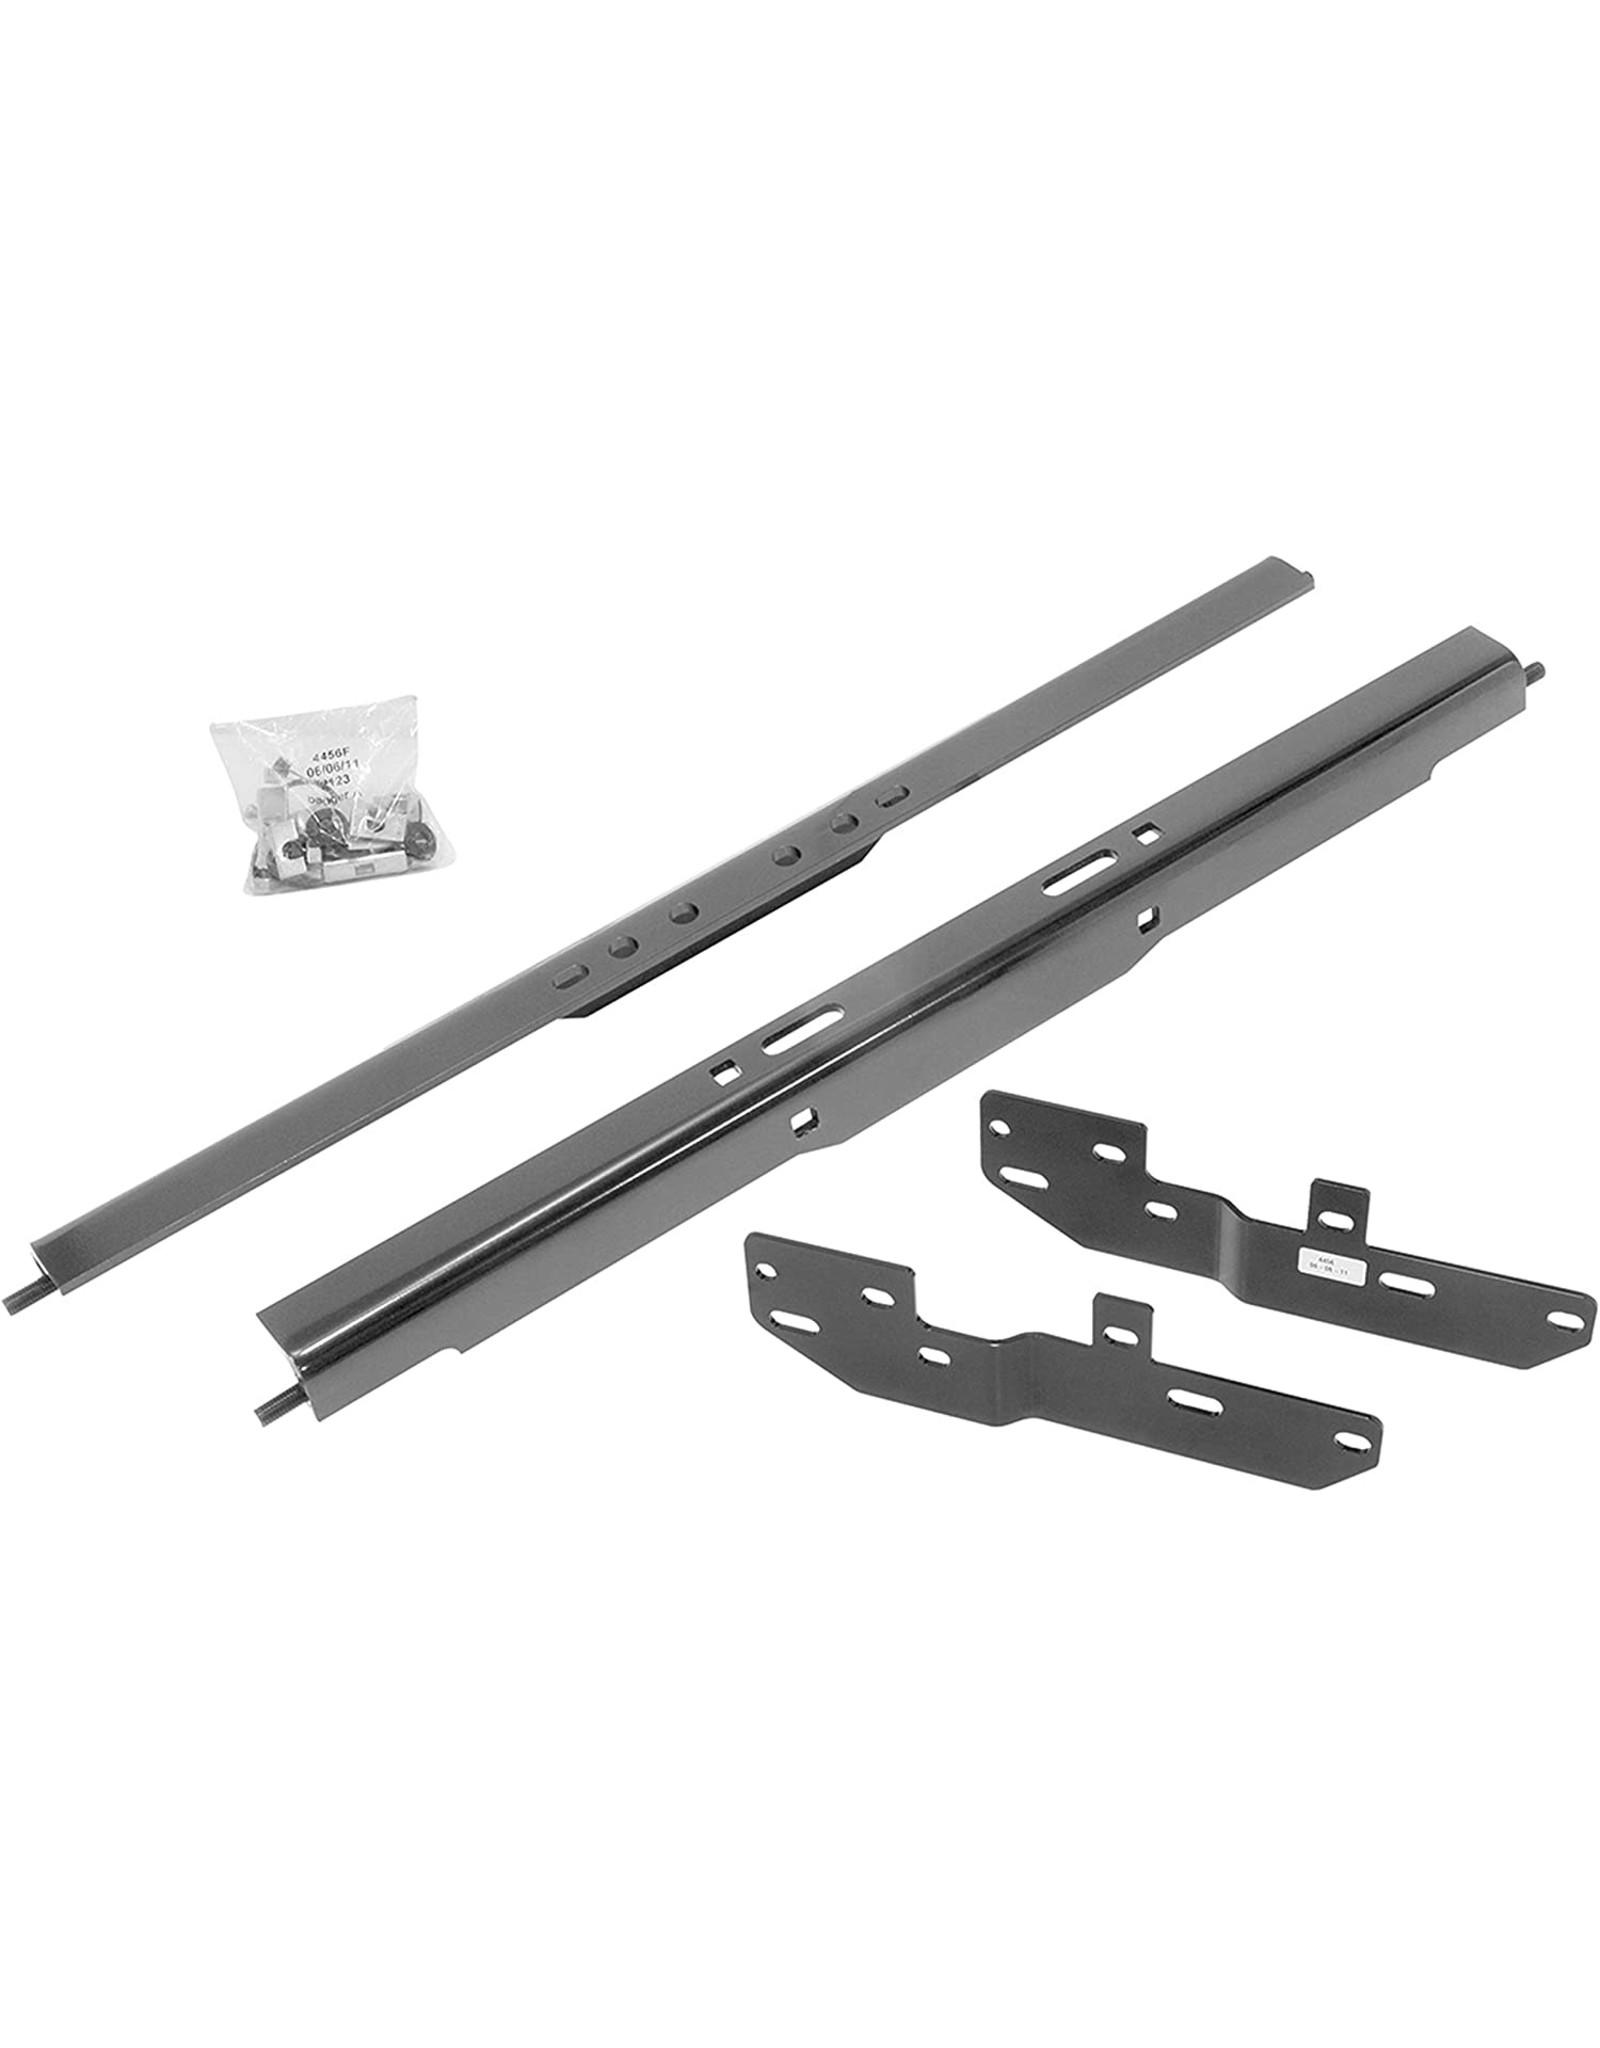 Draw-Tite Draw-Tite 4456 Gooseneck Rail Kit for GM